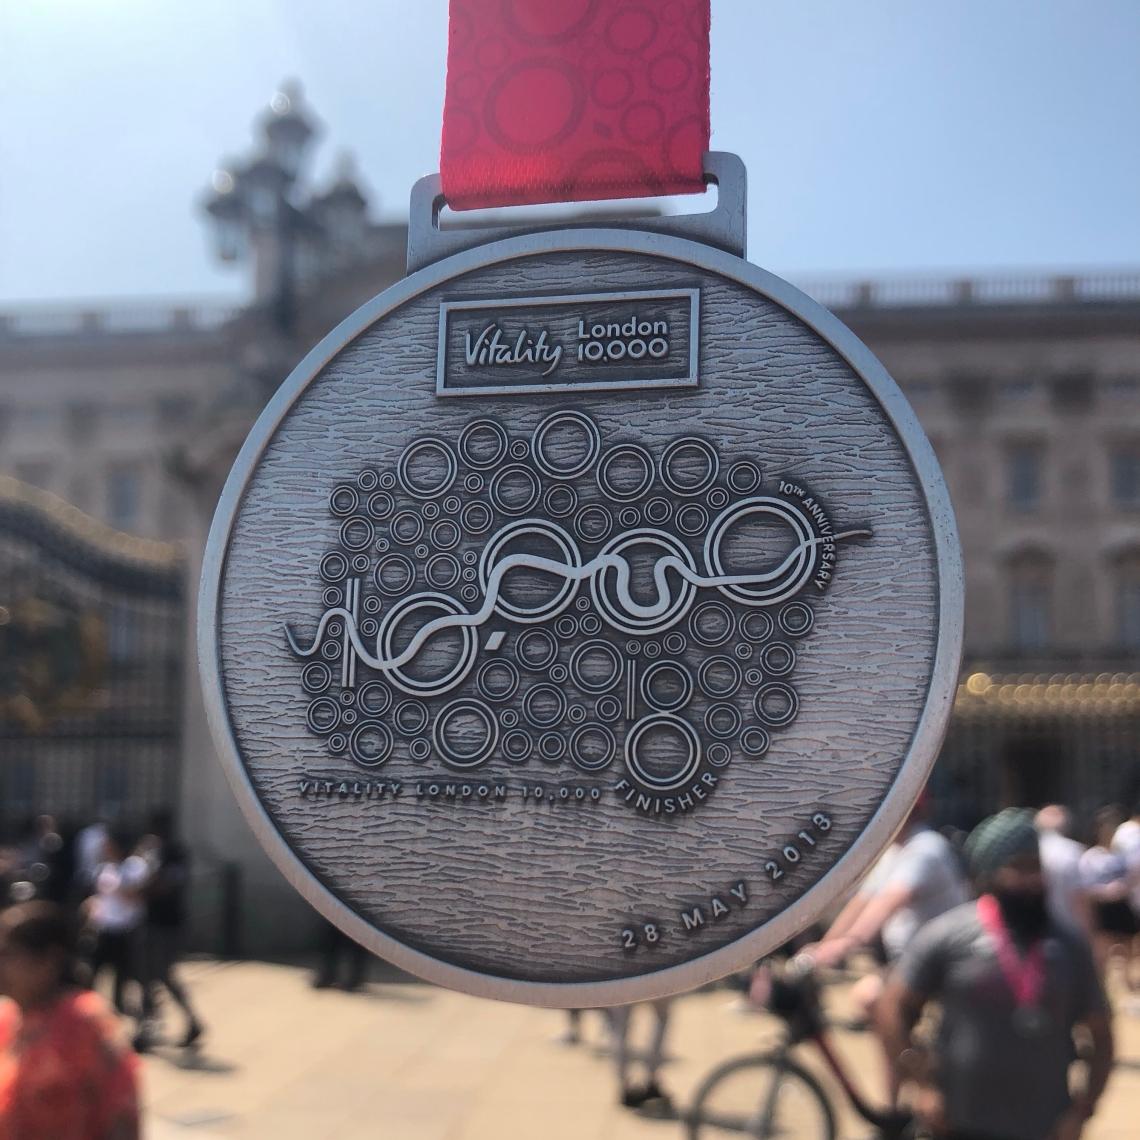 Vitality London 10,000 Medal